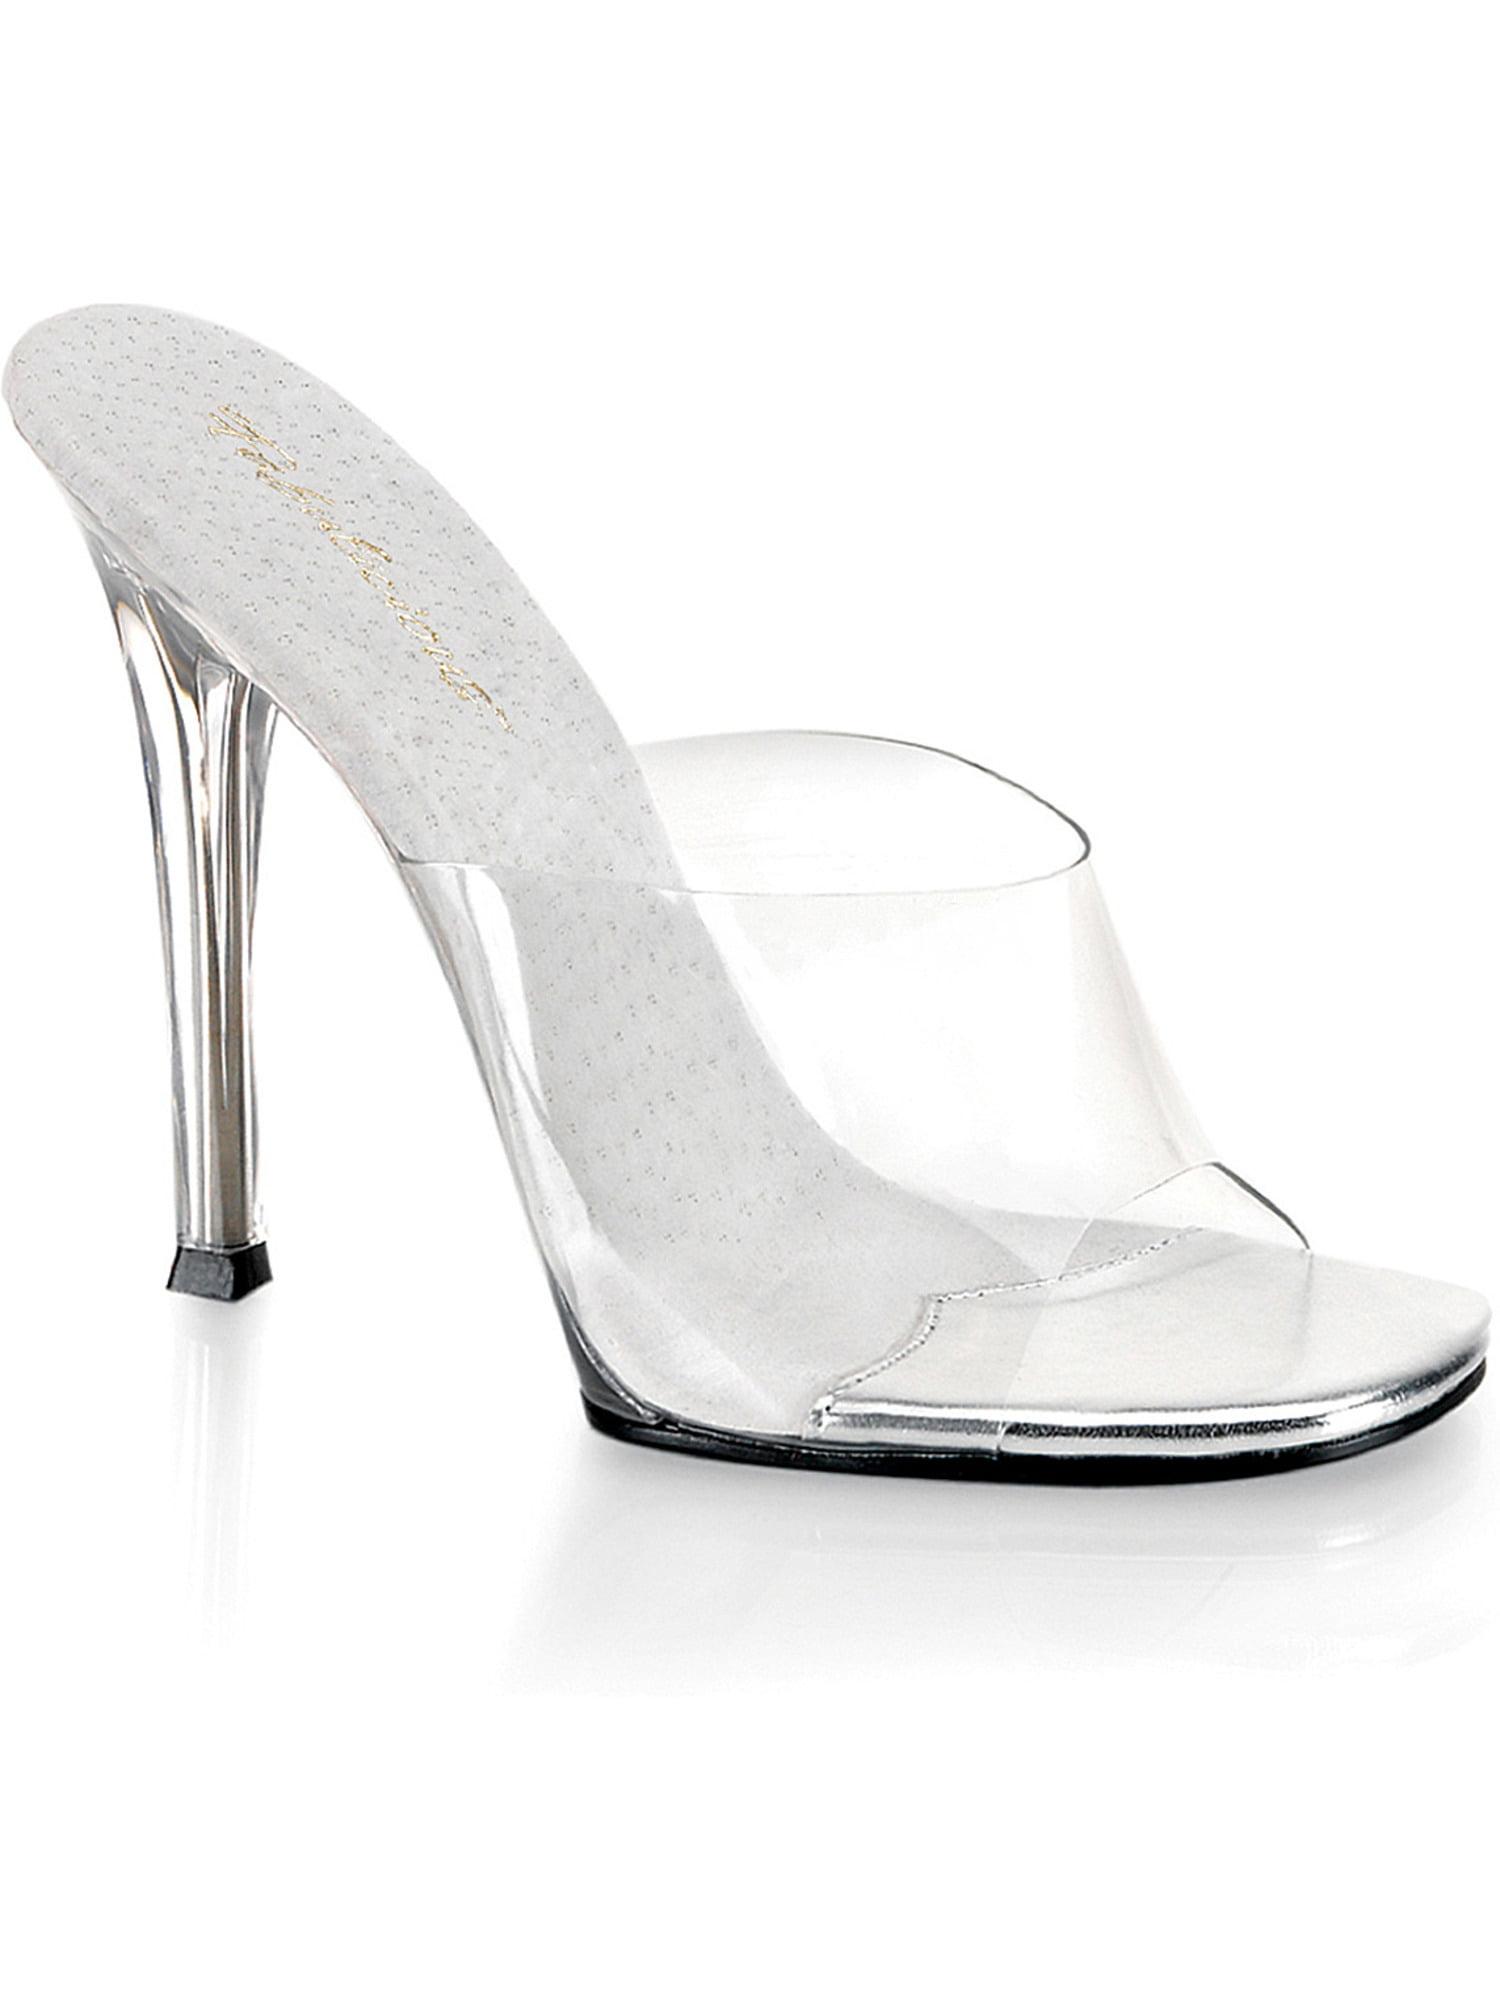 womens 5 inch sexy high heel shoes stiletto heel slip on slides clear sandals